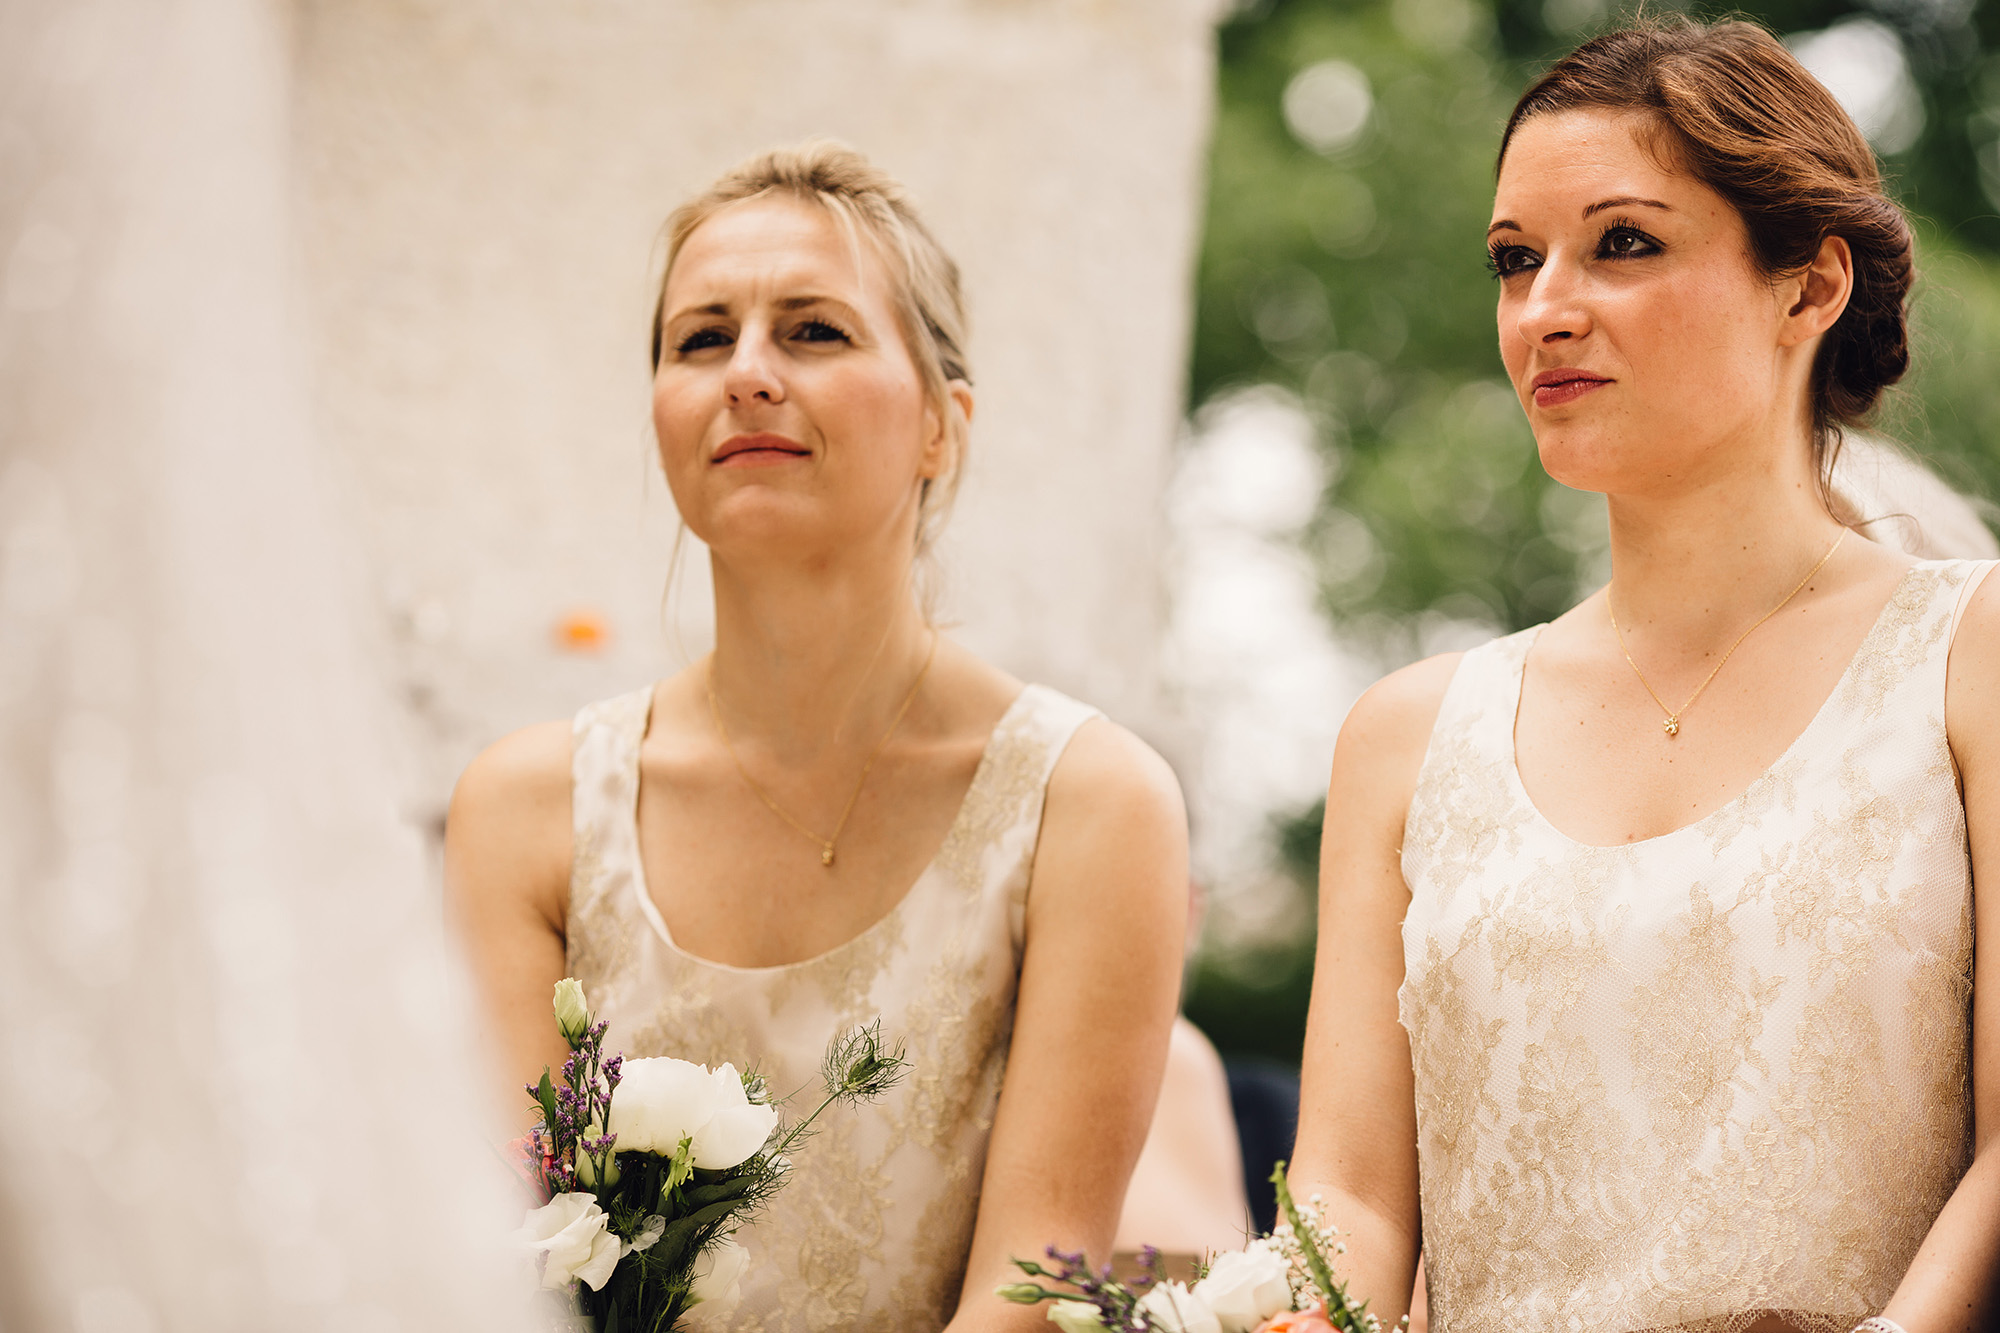 Hannah-Bespoke-Bridesmaids-Bohemian-French-Wedding-Gold-Lace-Susanna-Greening-Designs-Matlock-Derbyshire-13